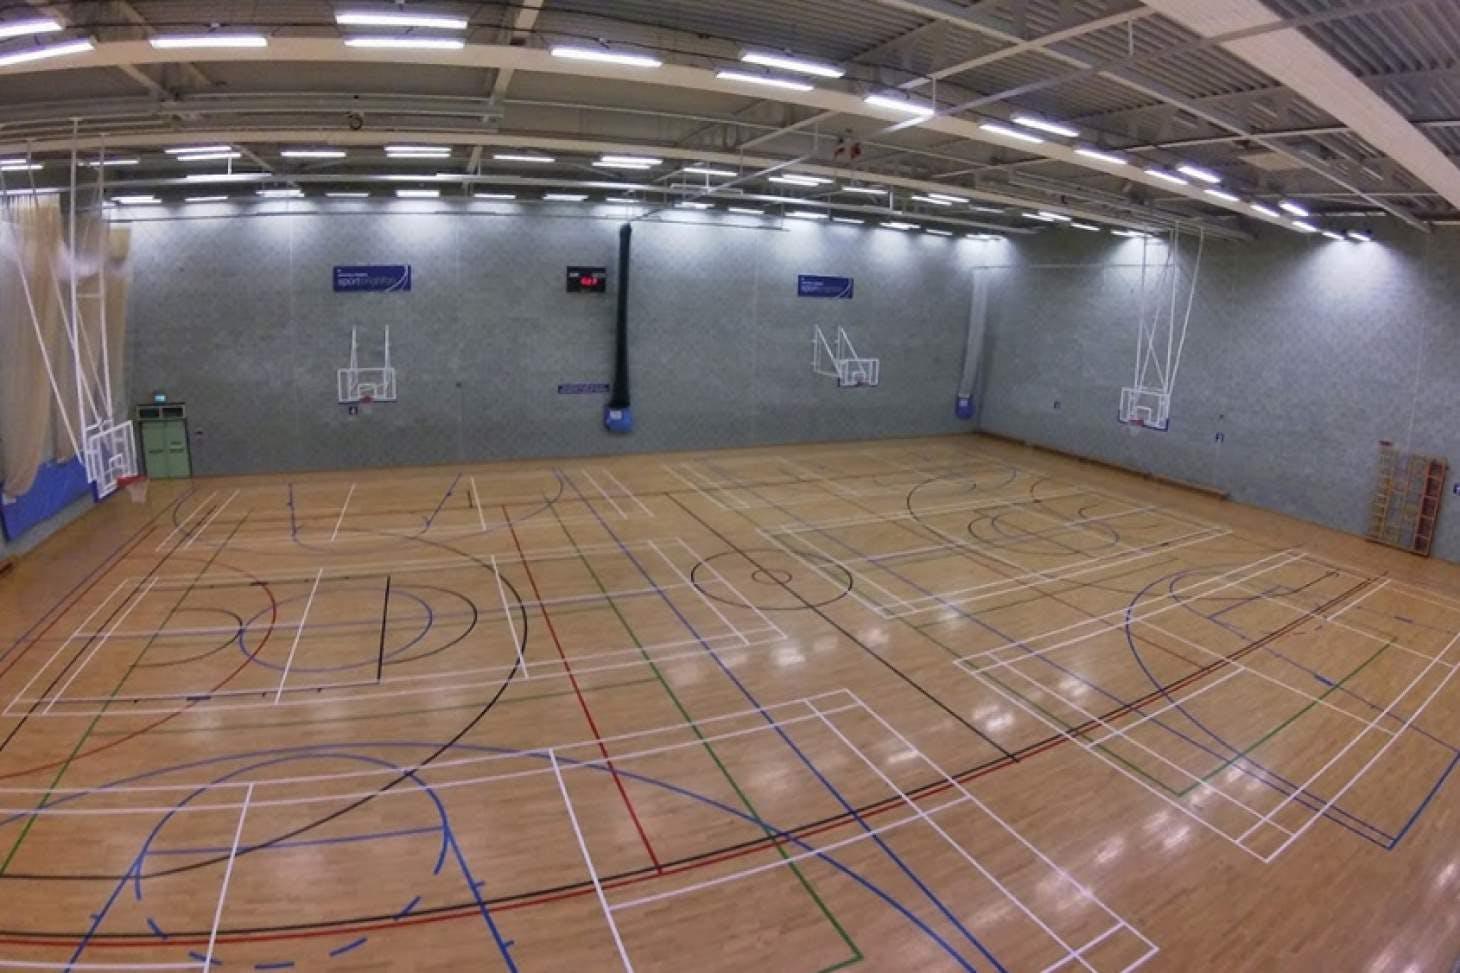 University Of Brighton (Falmer Campus) Indoor netball court